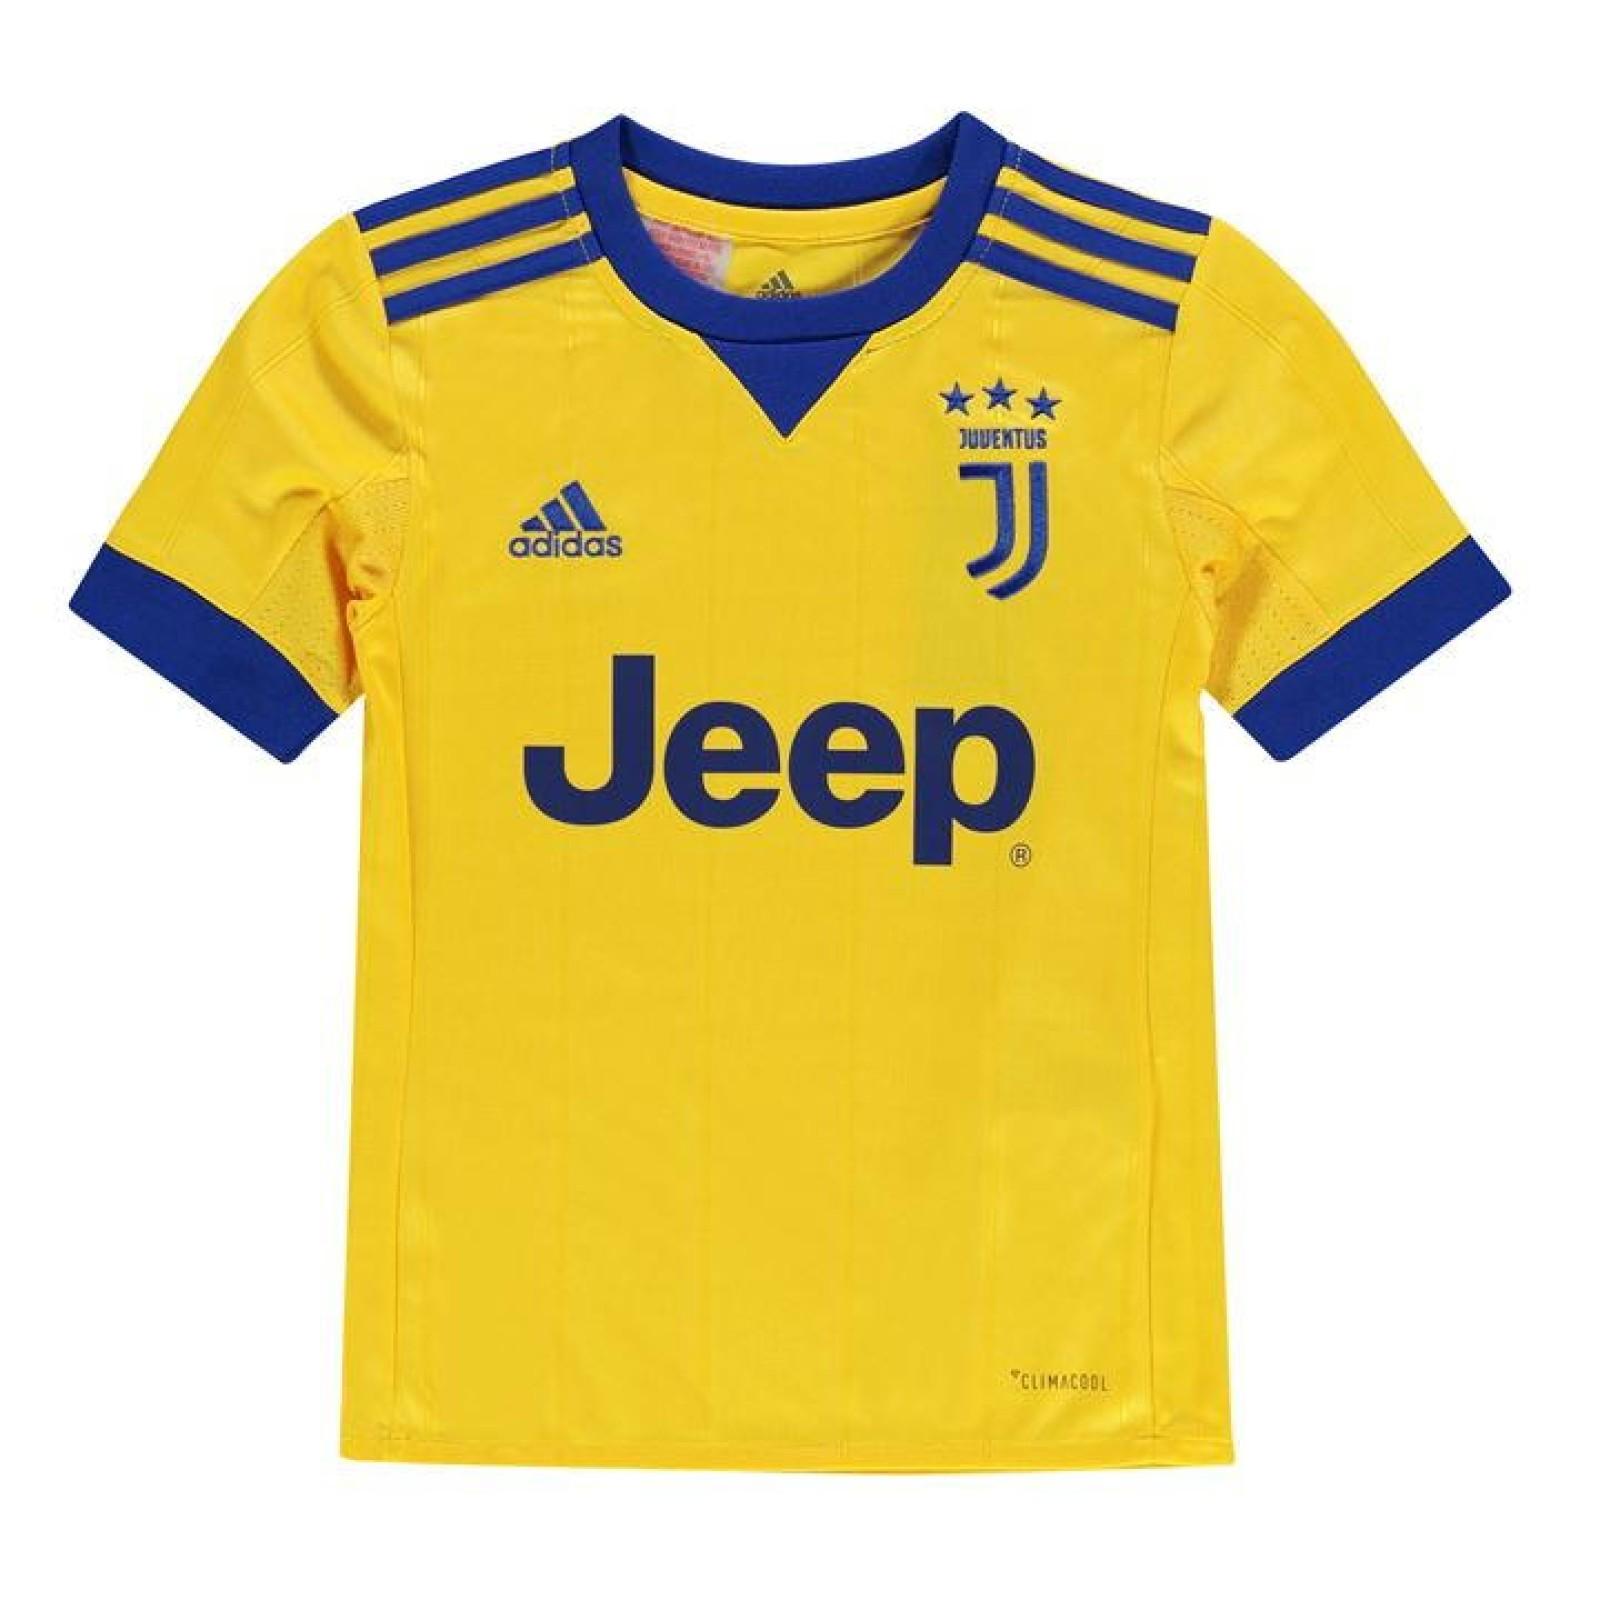 finest selection 7a785 ba78f Childrens Juventus Away 2017/18 Football Kit | Free Shirt ...